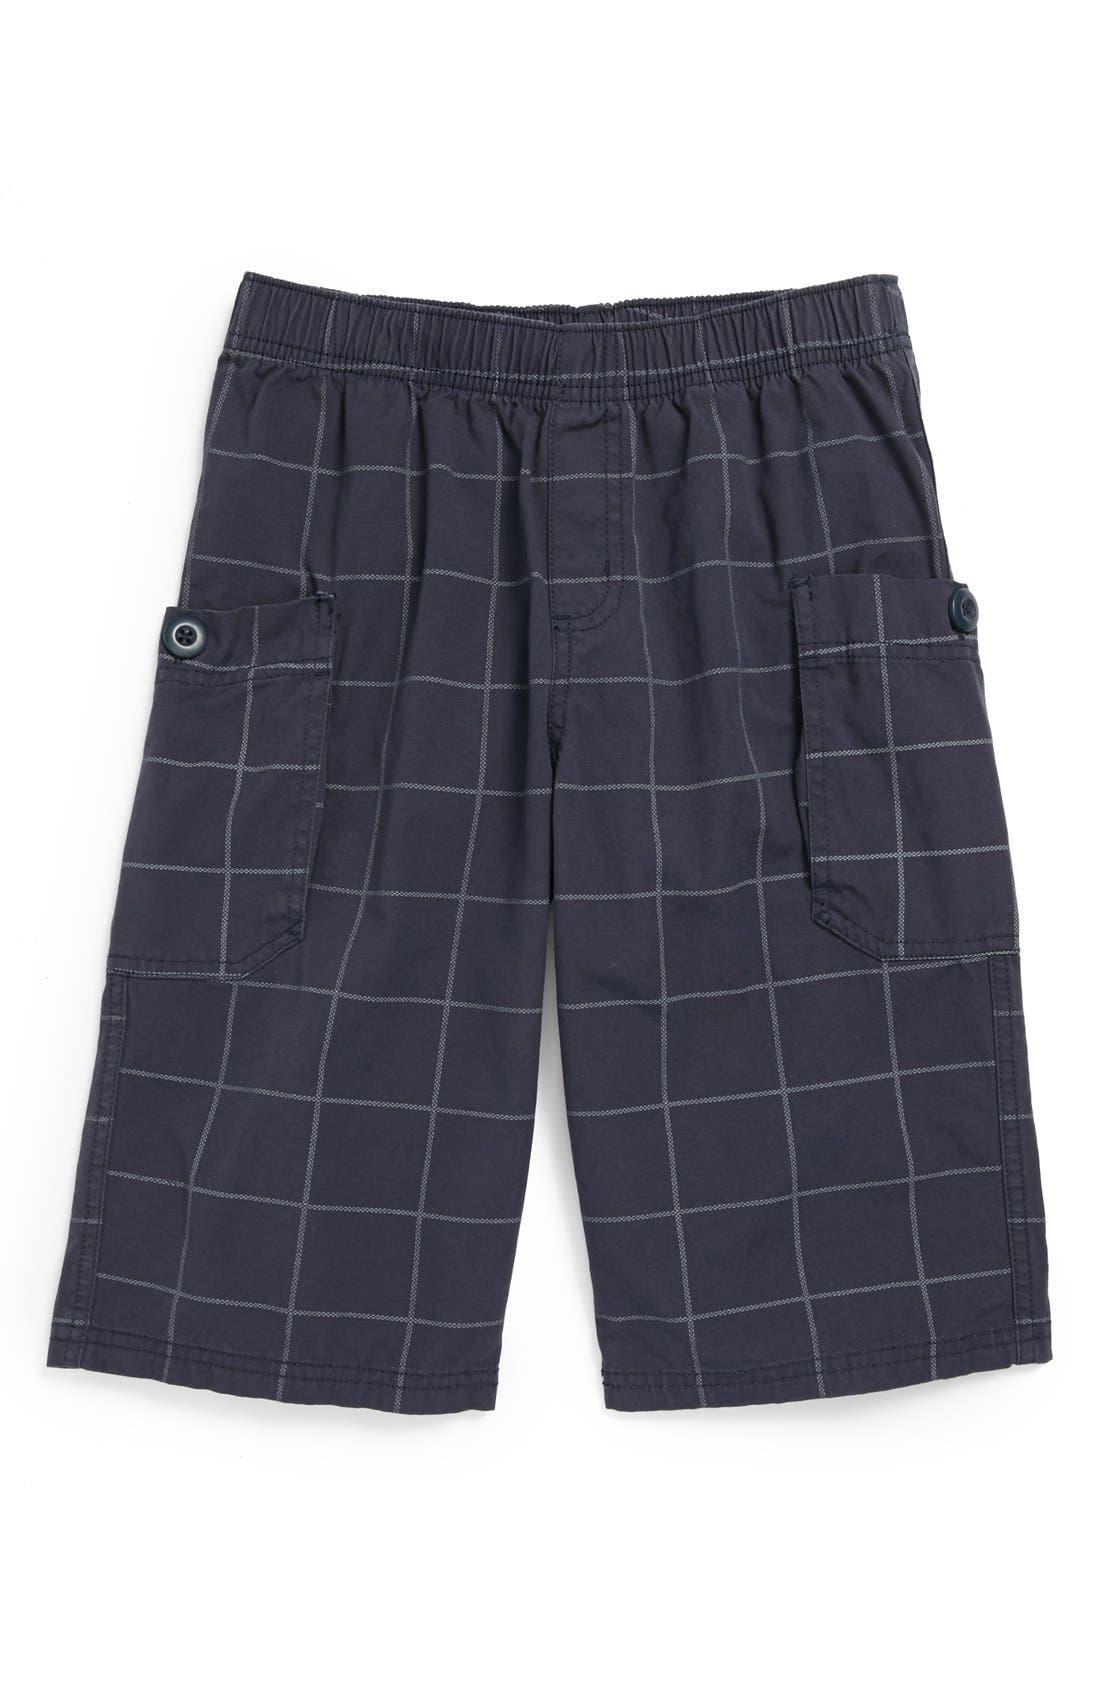 Alternate Image 1 Selected - Tea Collection 'Bafana' Plaid Shorts (Little Boys & Big Boys)